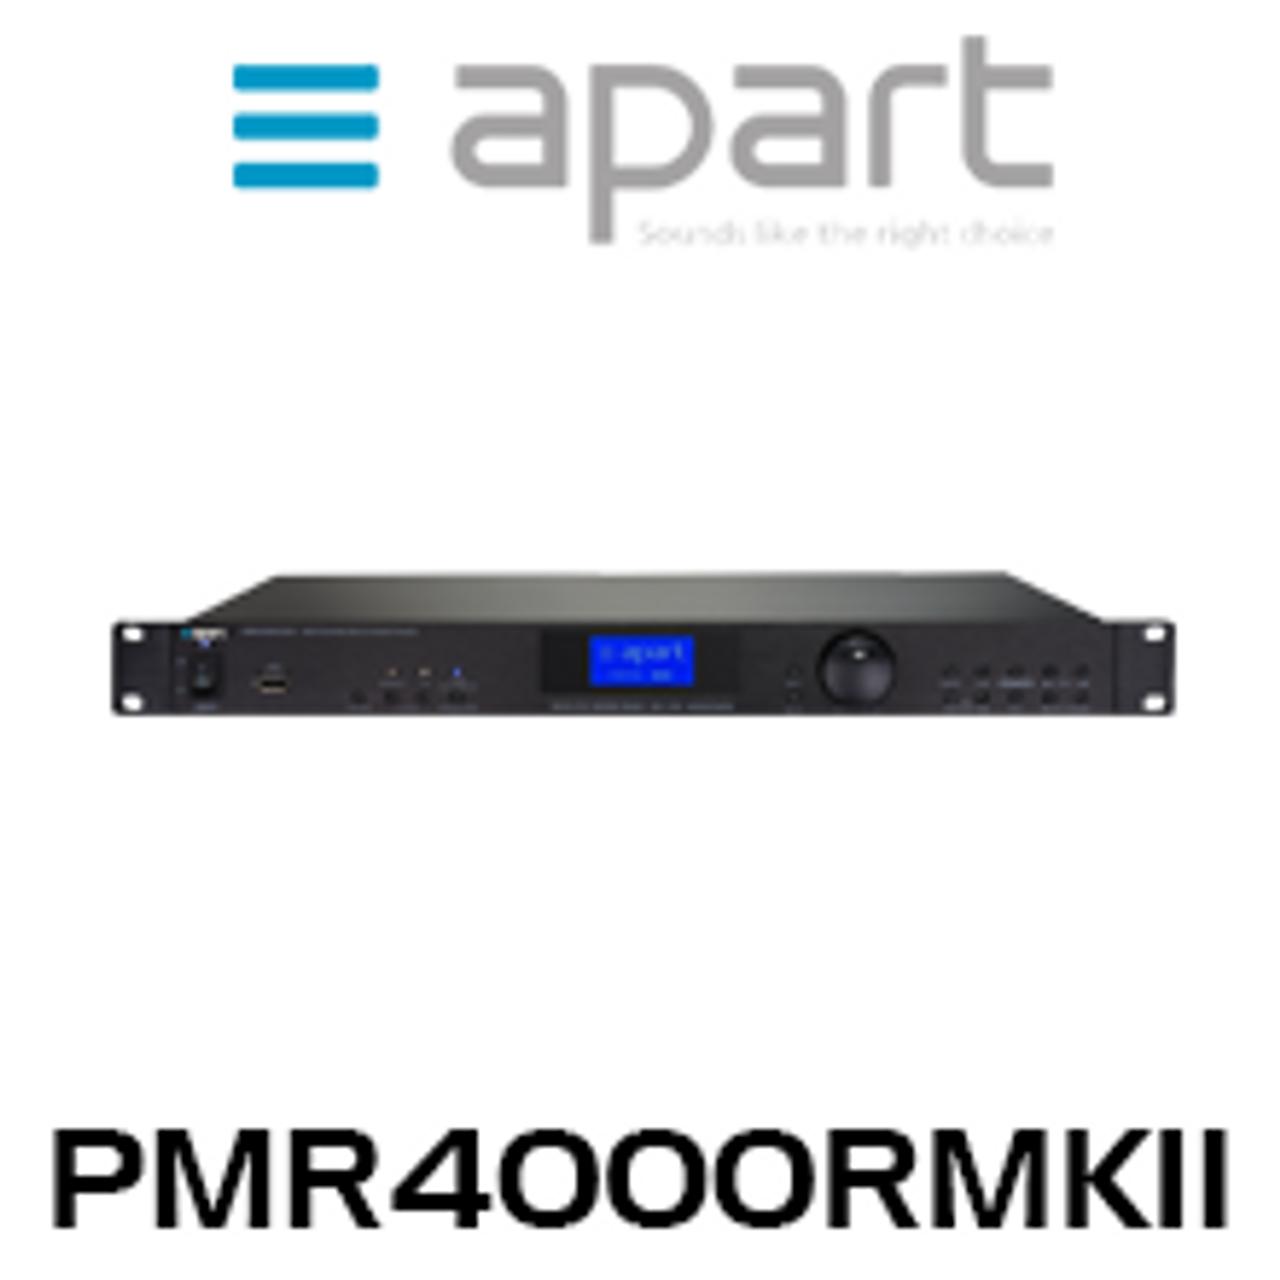 APart PMR4000RMKII Music Player with Internet Radio/ FM/ USB/ UPNP